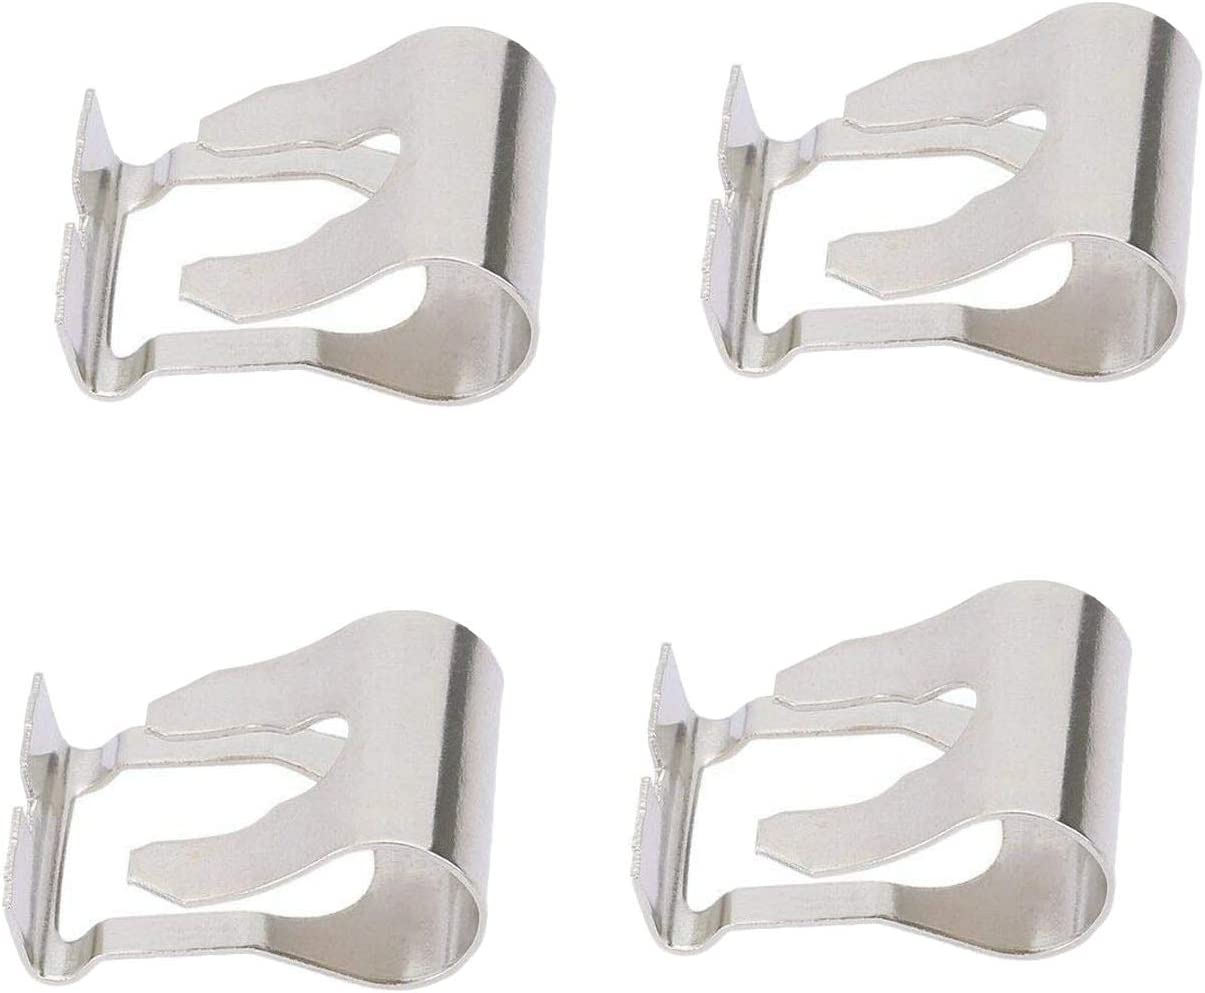 Wiper Linkage Motor Repair Clip Kit for Car Windscreen Wiper Windshield Linkage Repair Fixing Clips (2 Pair)